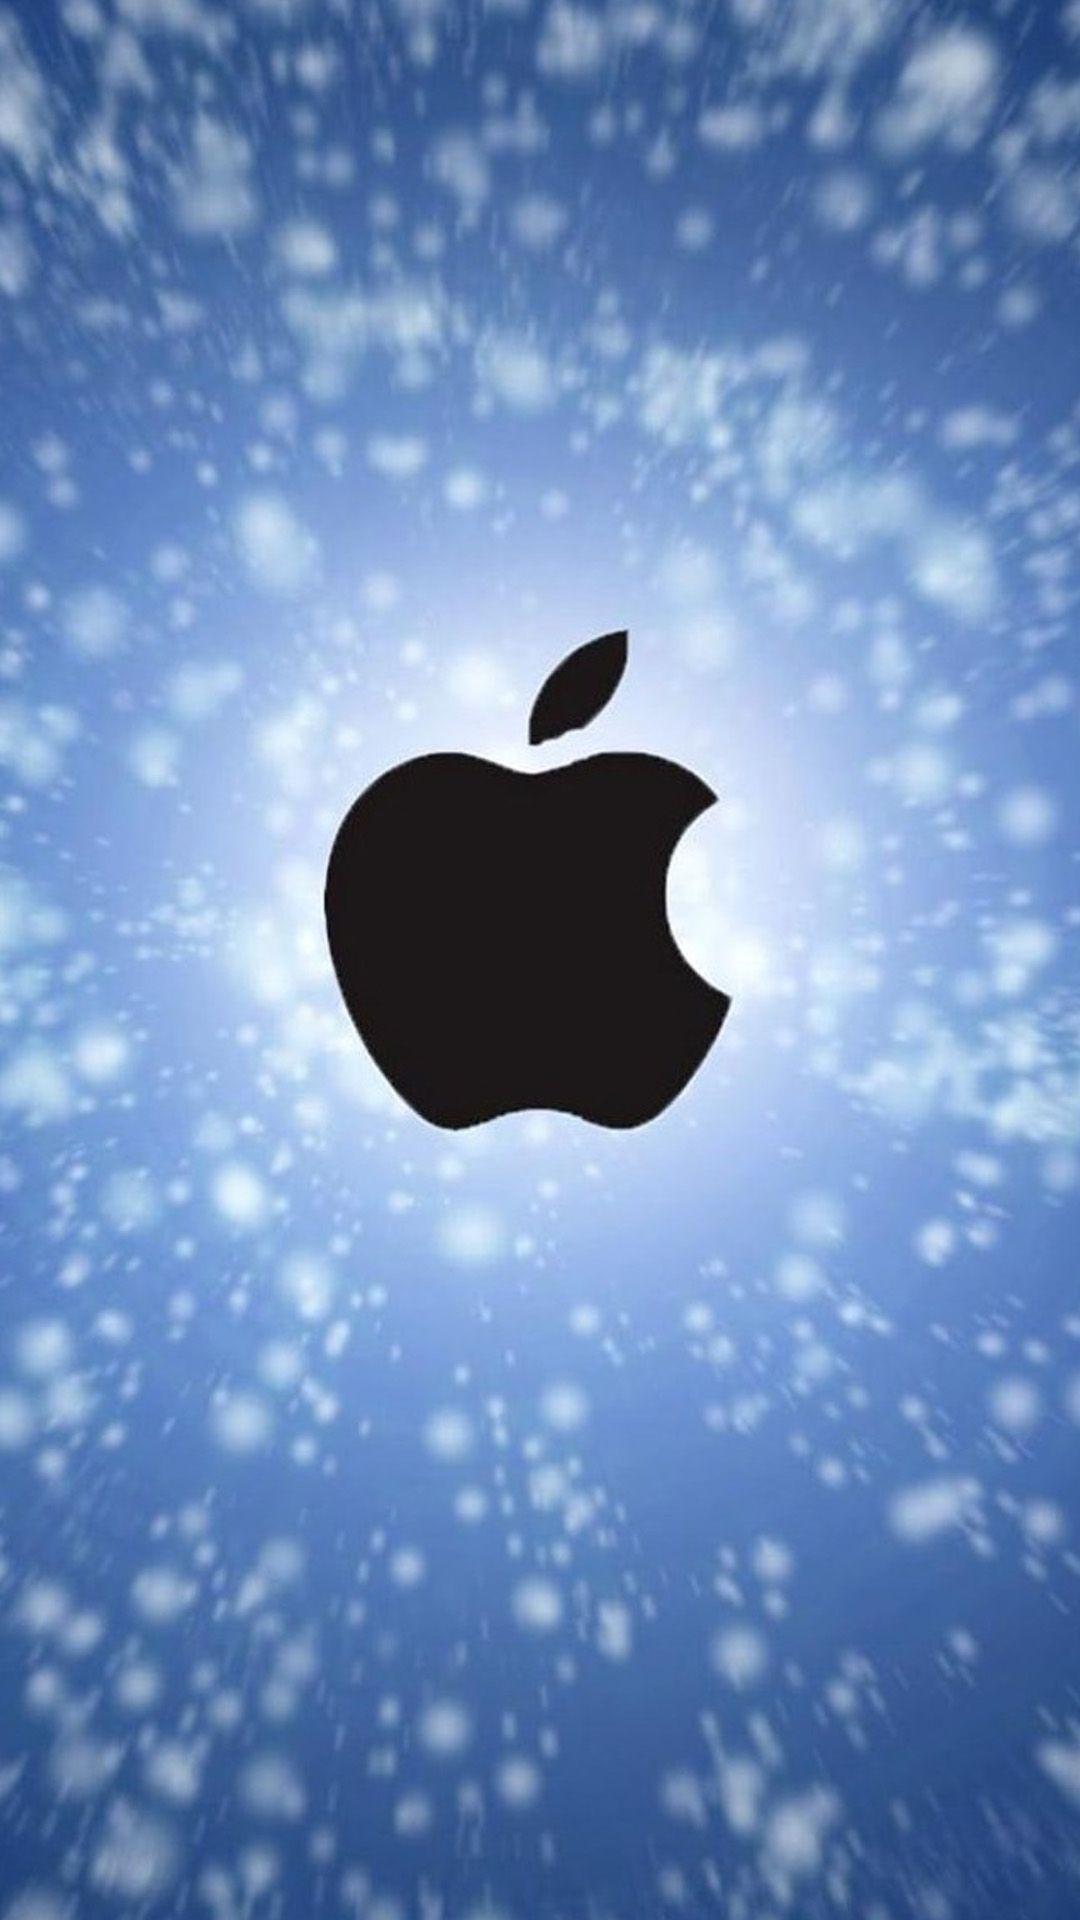 Apple IPhone Dynamic Wallpaper HD